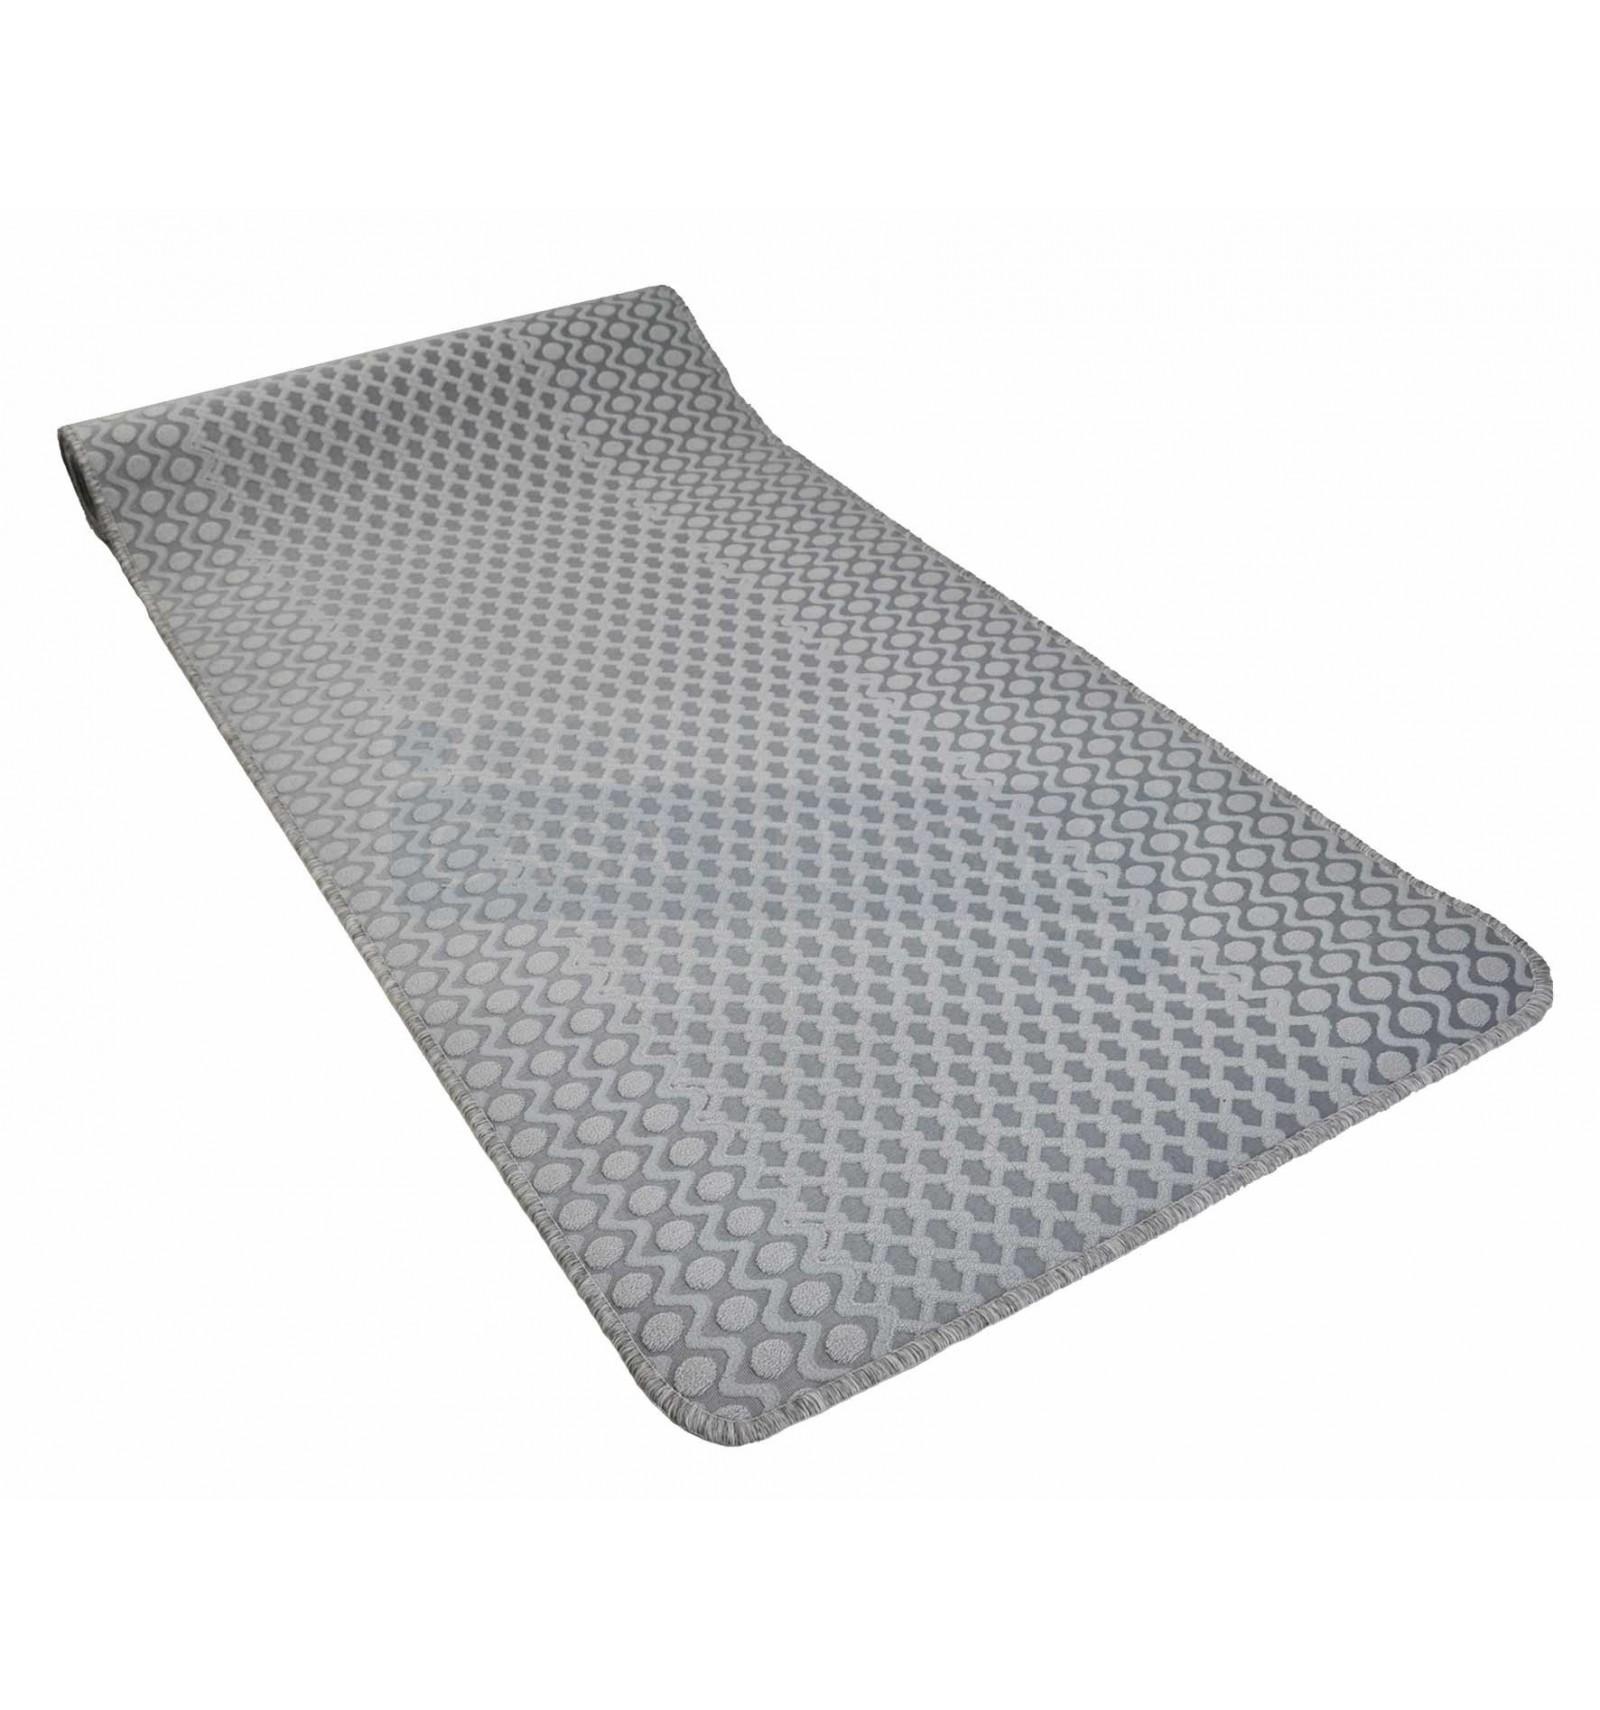 Catene 3d tapis de cuisine large de 68 cm casatessile for Tapis de cuisine personnalise